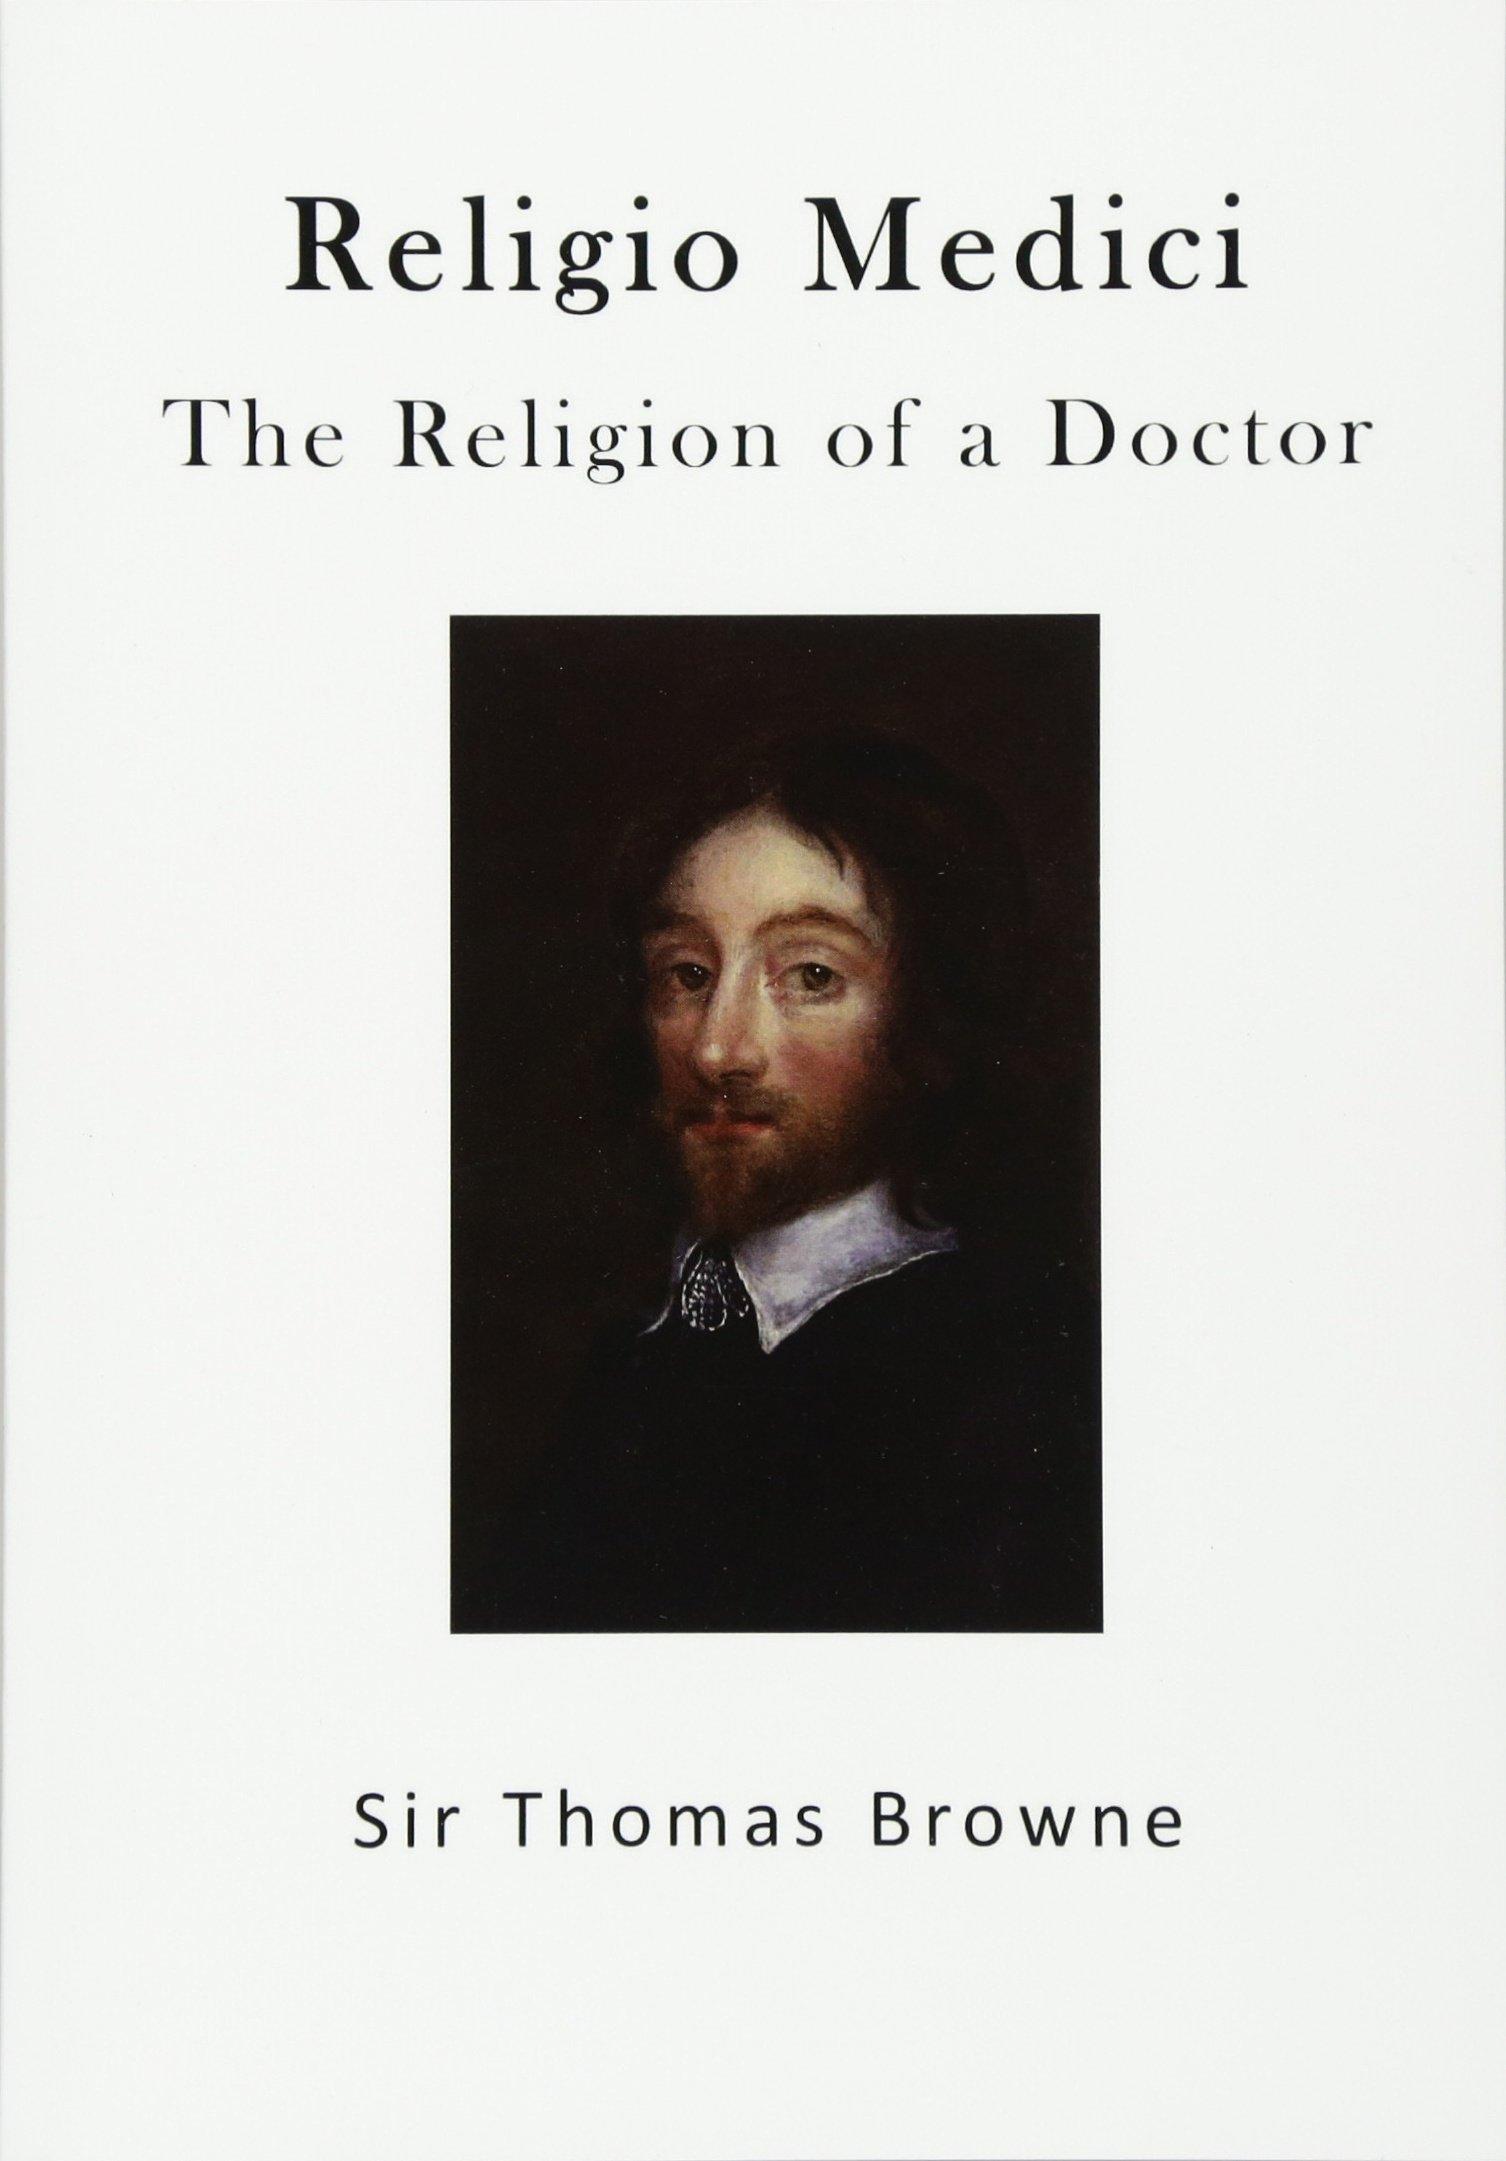 The Religion of a Doctor: Religio Medici: Sir Thomas Browne: 9781523275533:  Amazon.com: Books